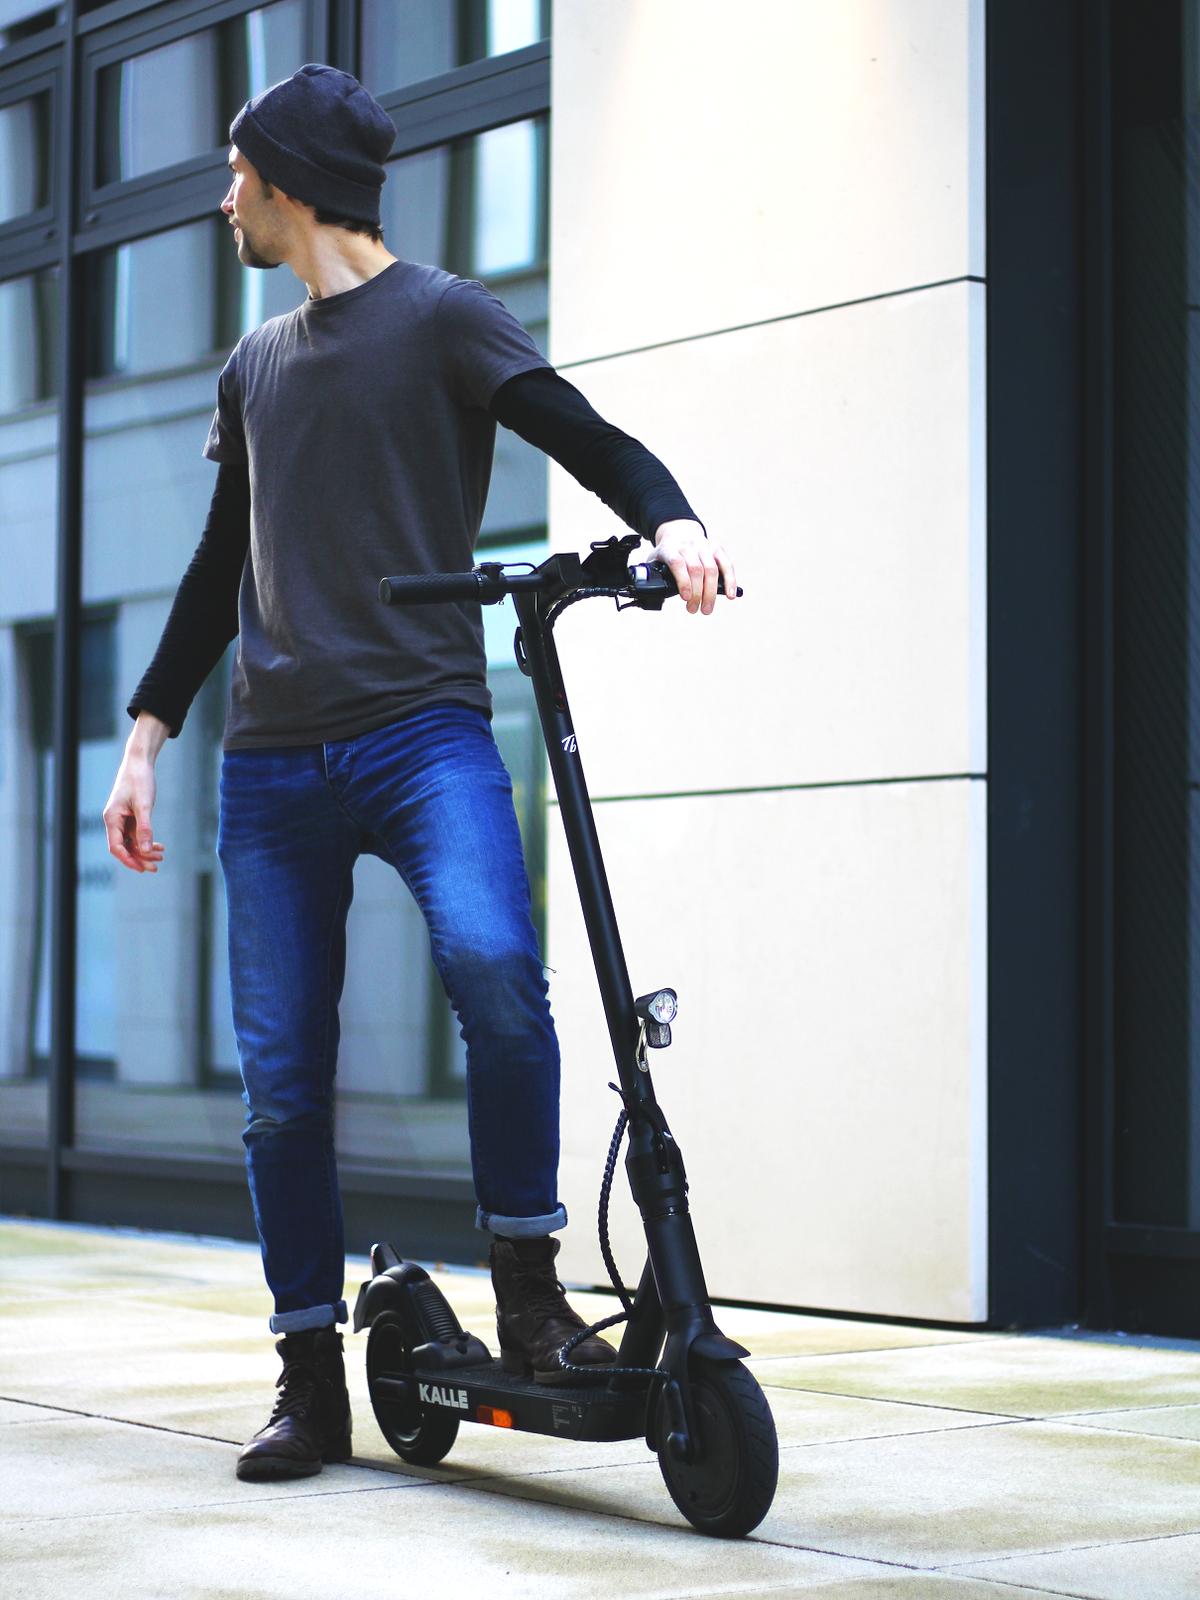 Kalle City 2.1 E-Scooter mit Zulassung nach eKFV